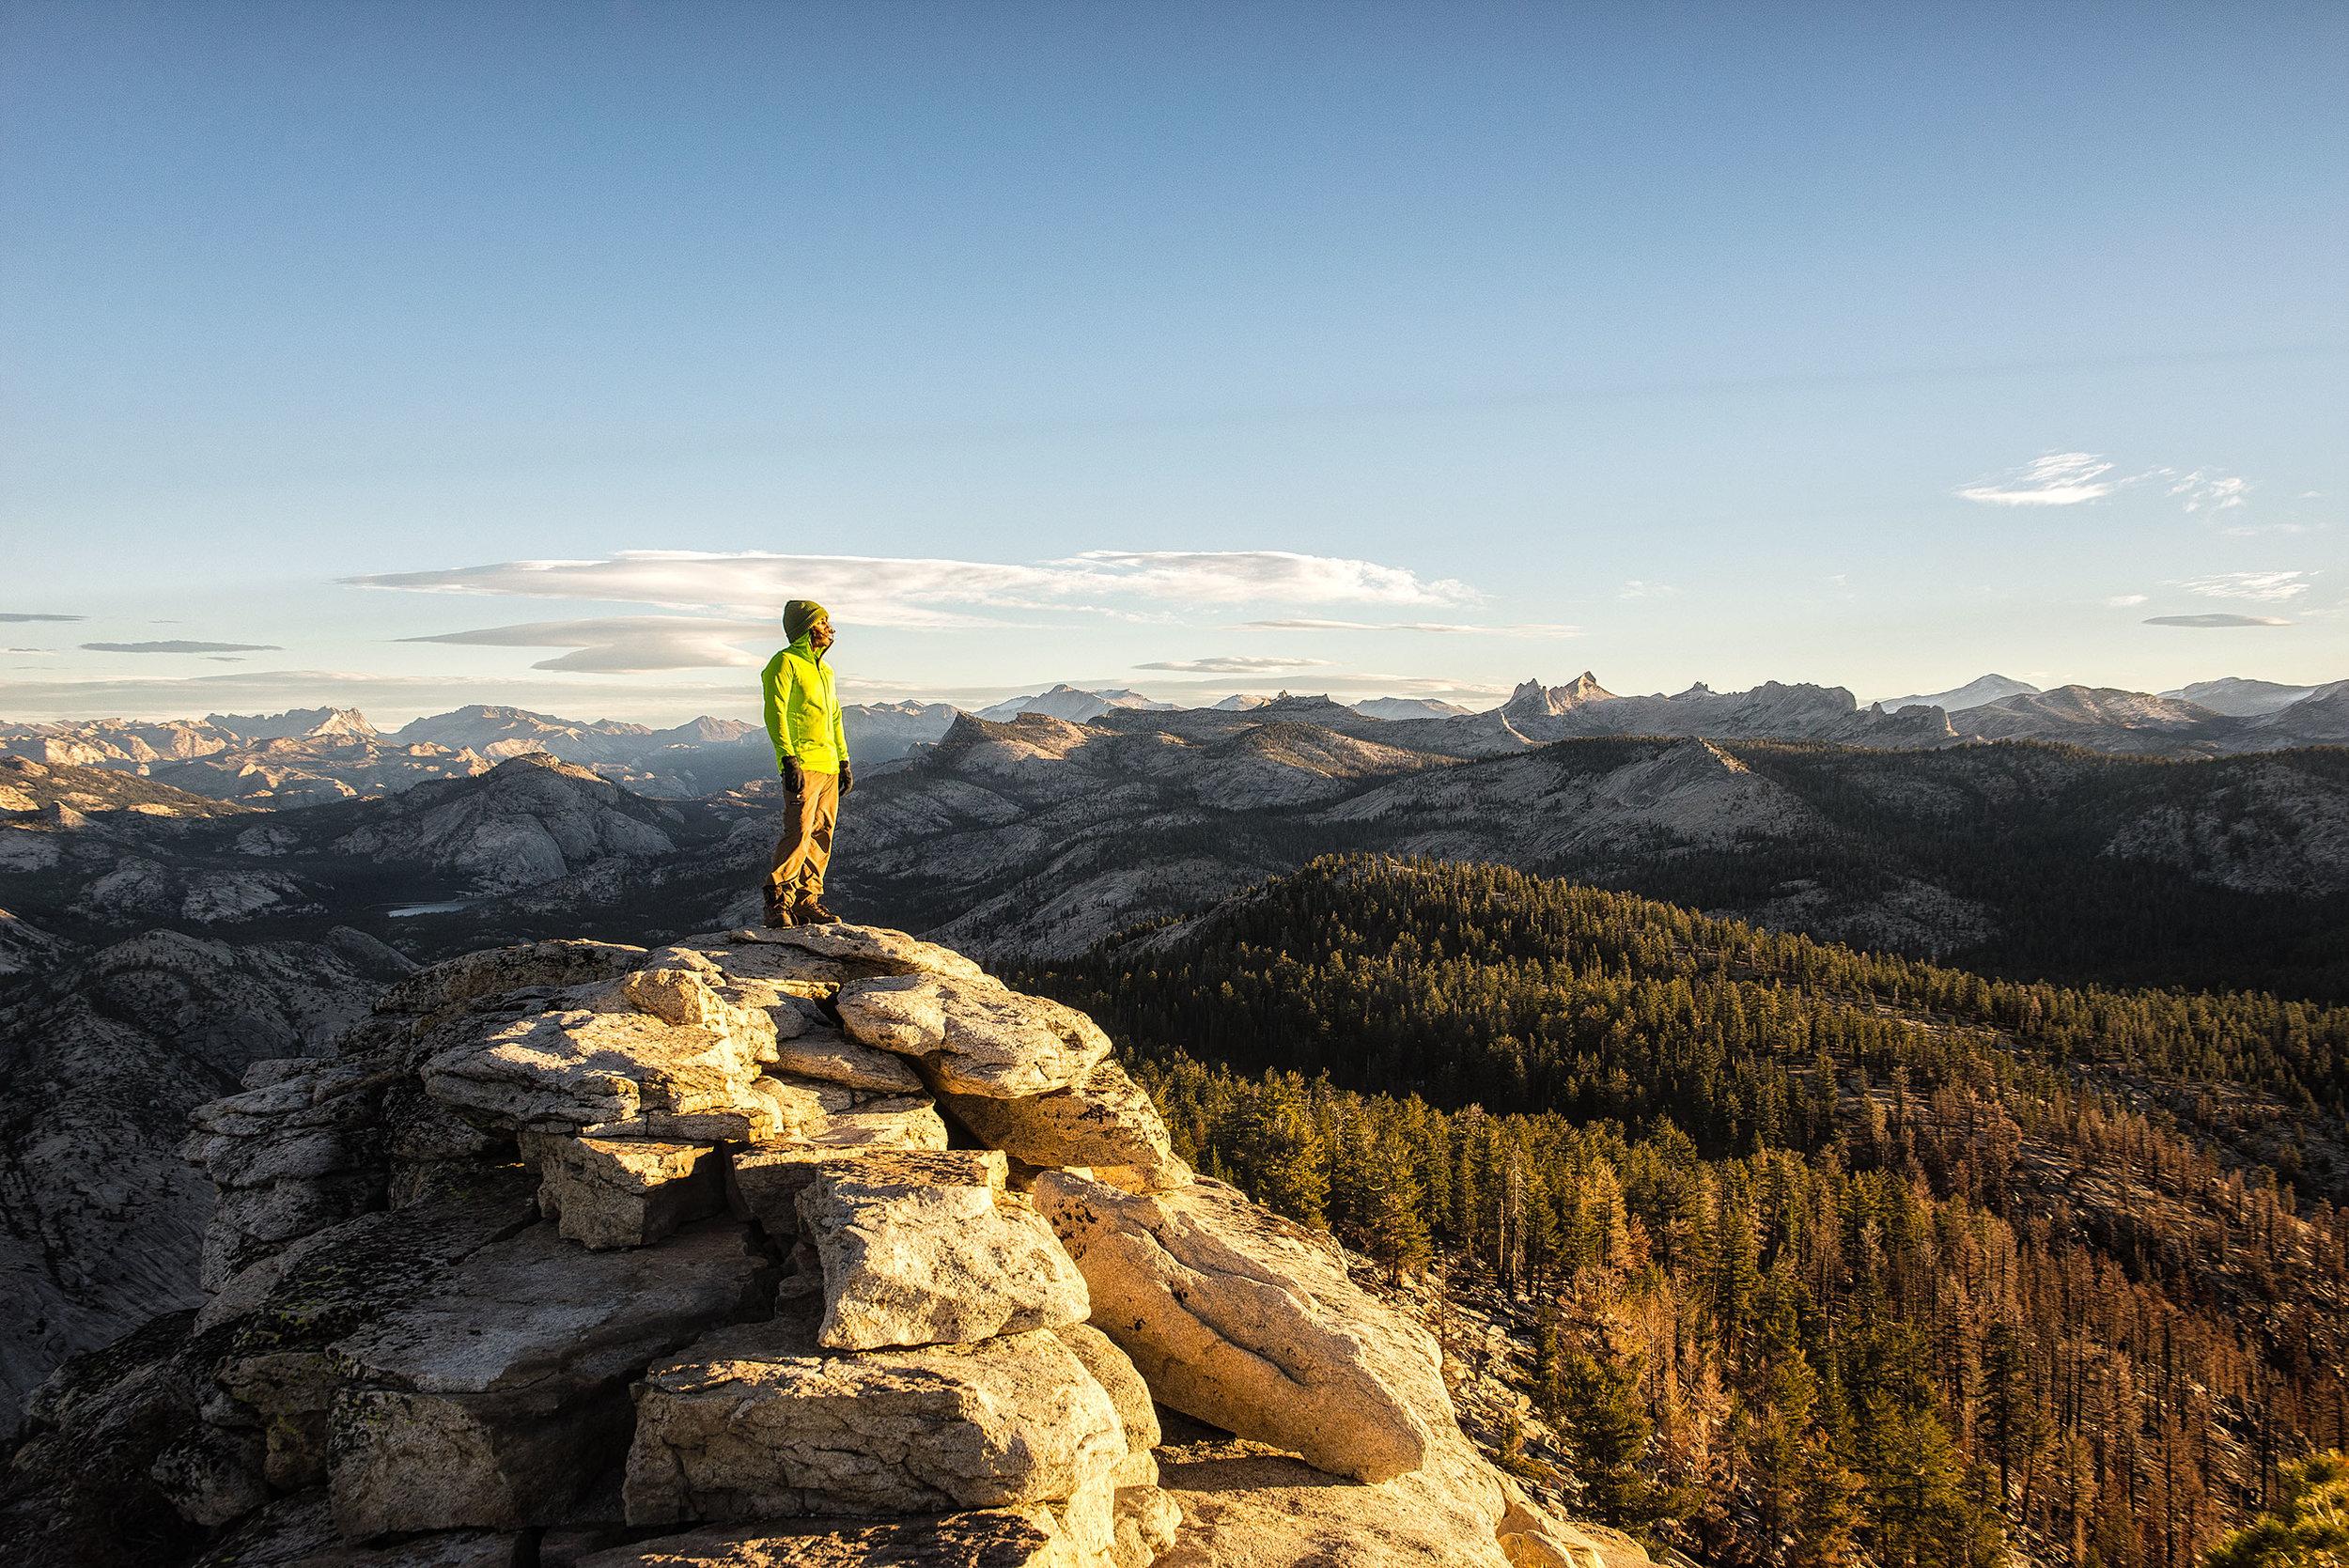 austin-trigg-yosemite-national-park-high-country-mountains-sunrise-clouds-rest-california.jpg